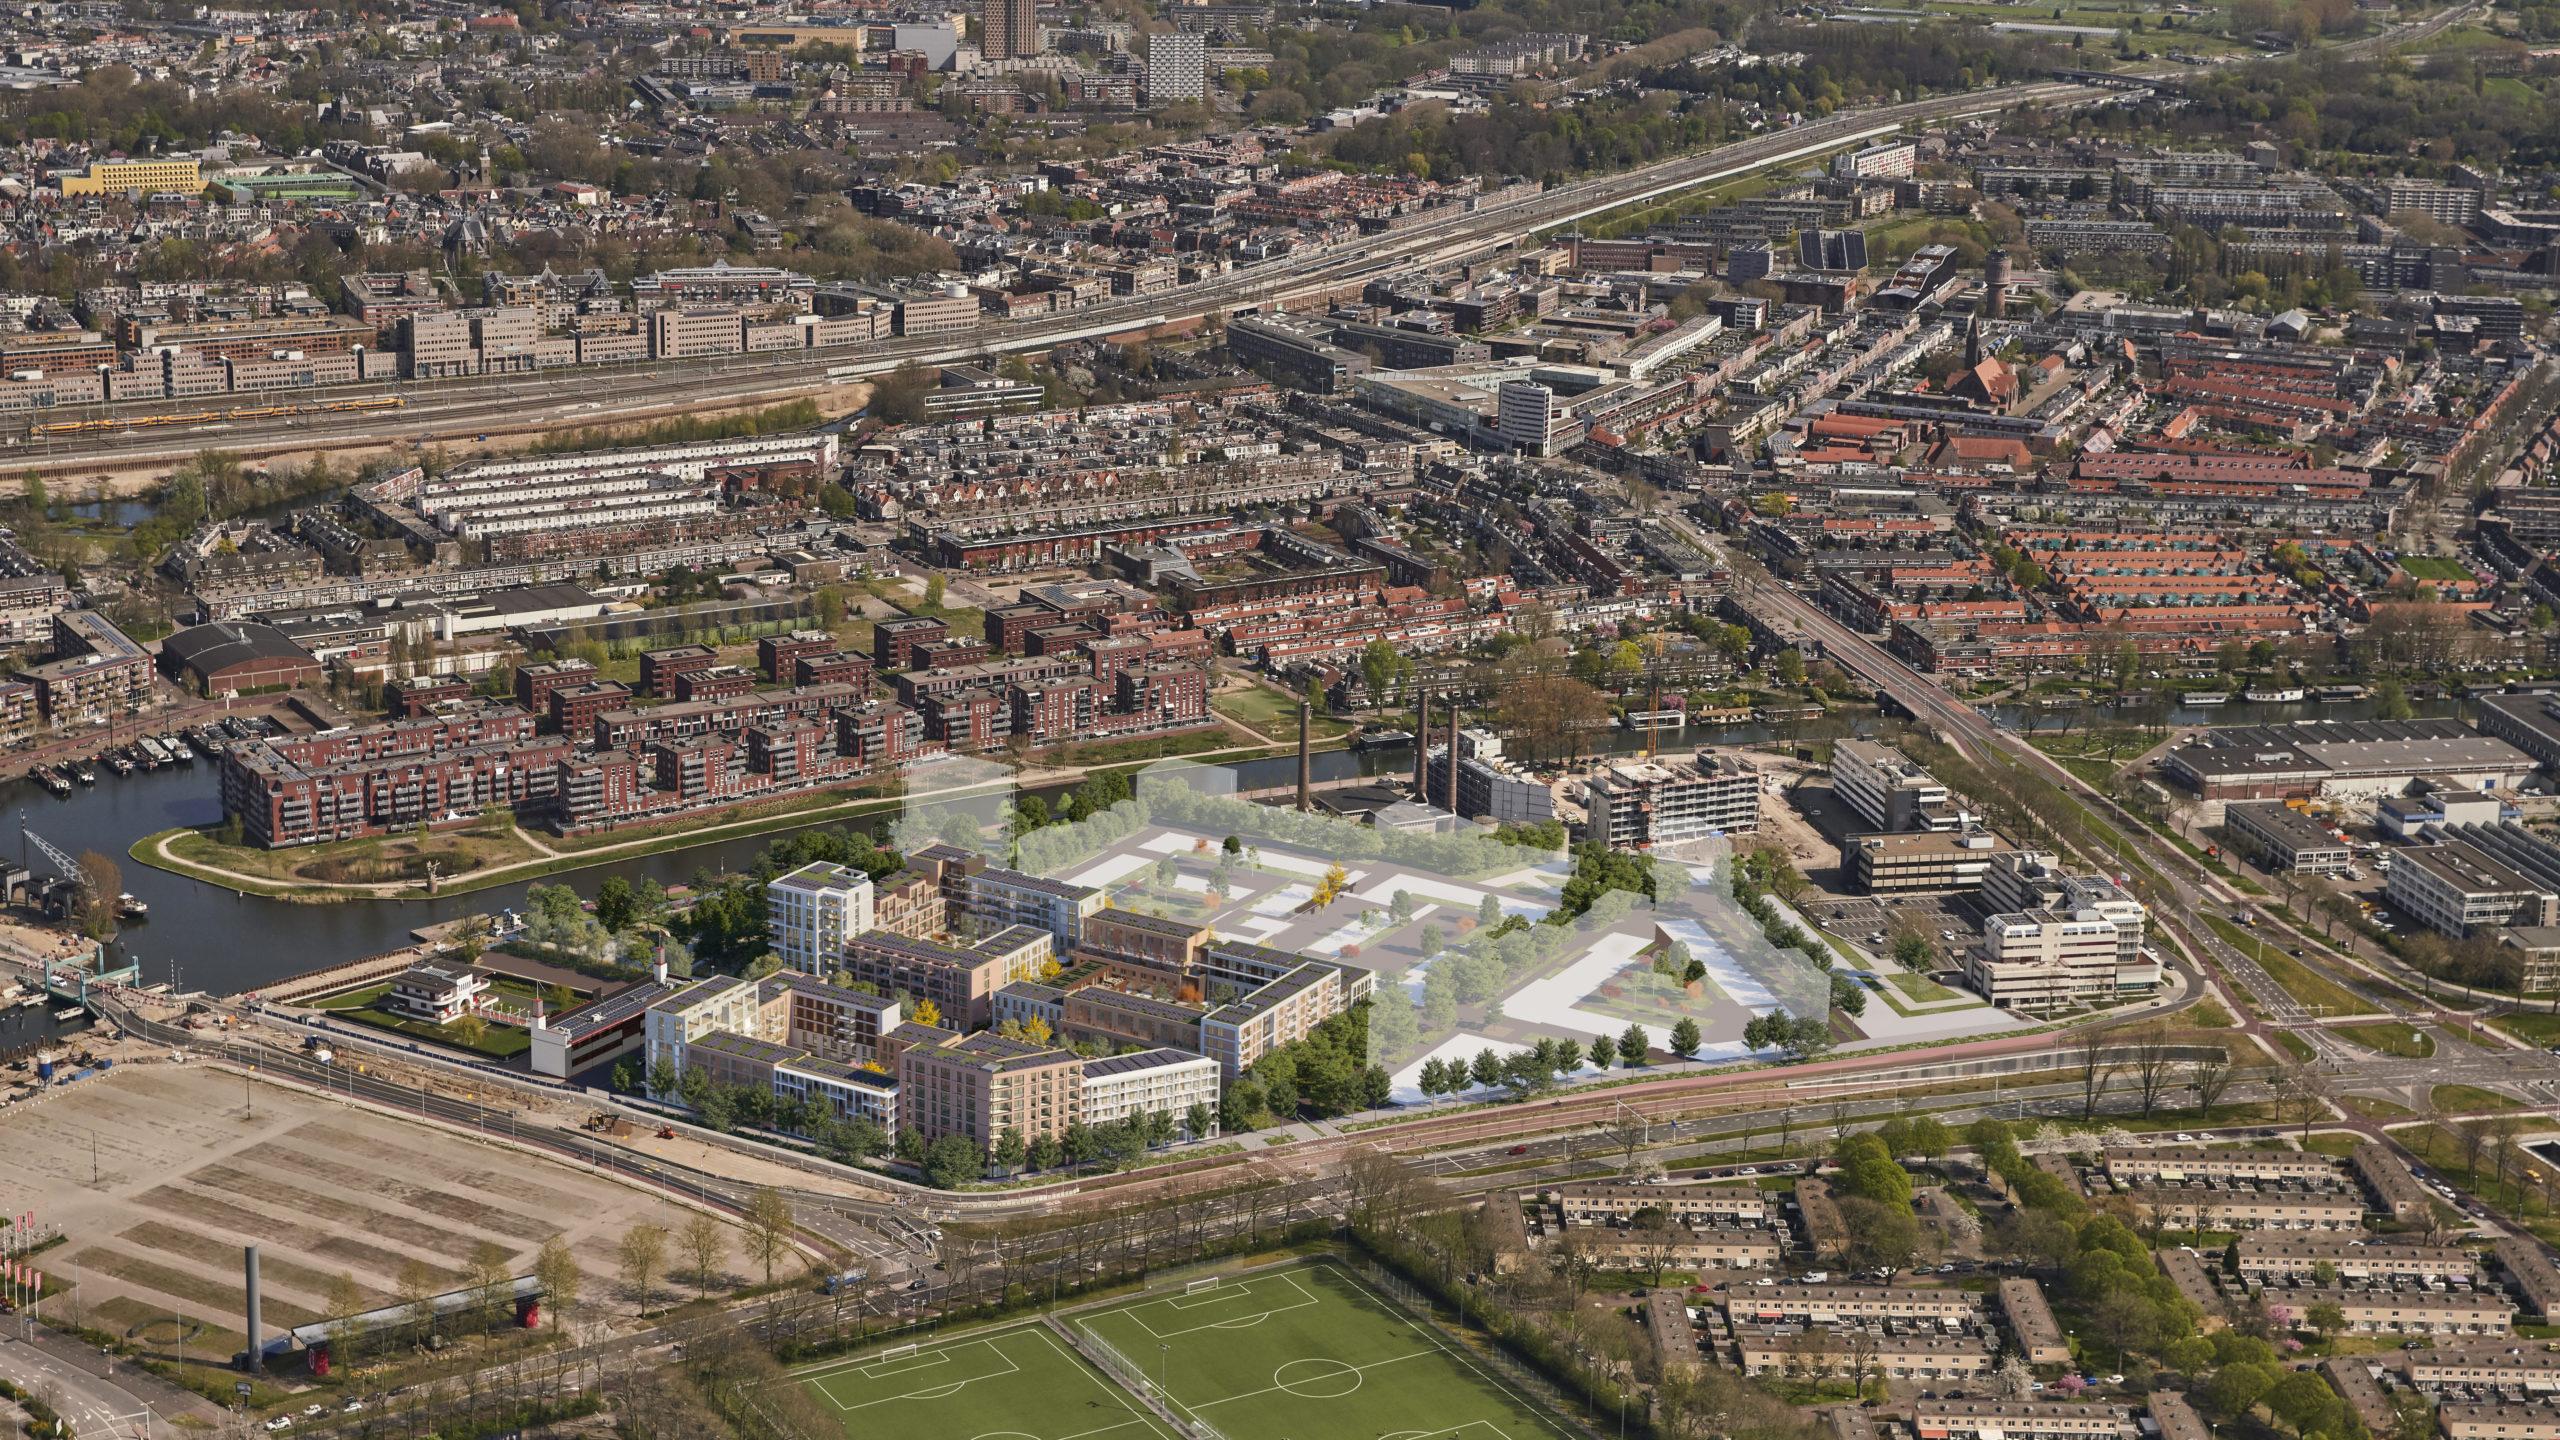 Defensieterrein Utrecht - Vogelvlucht (Copyright 3D capacity)